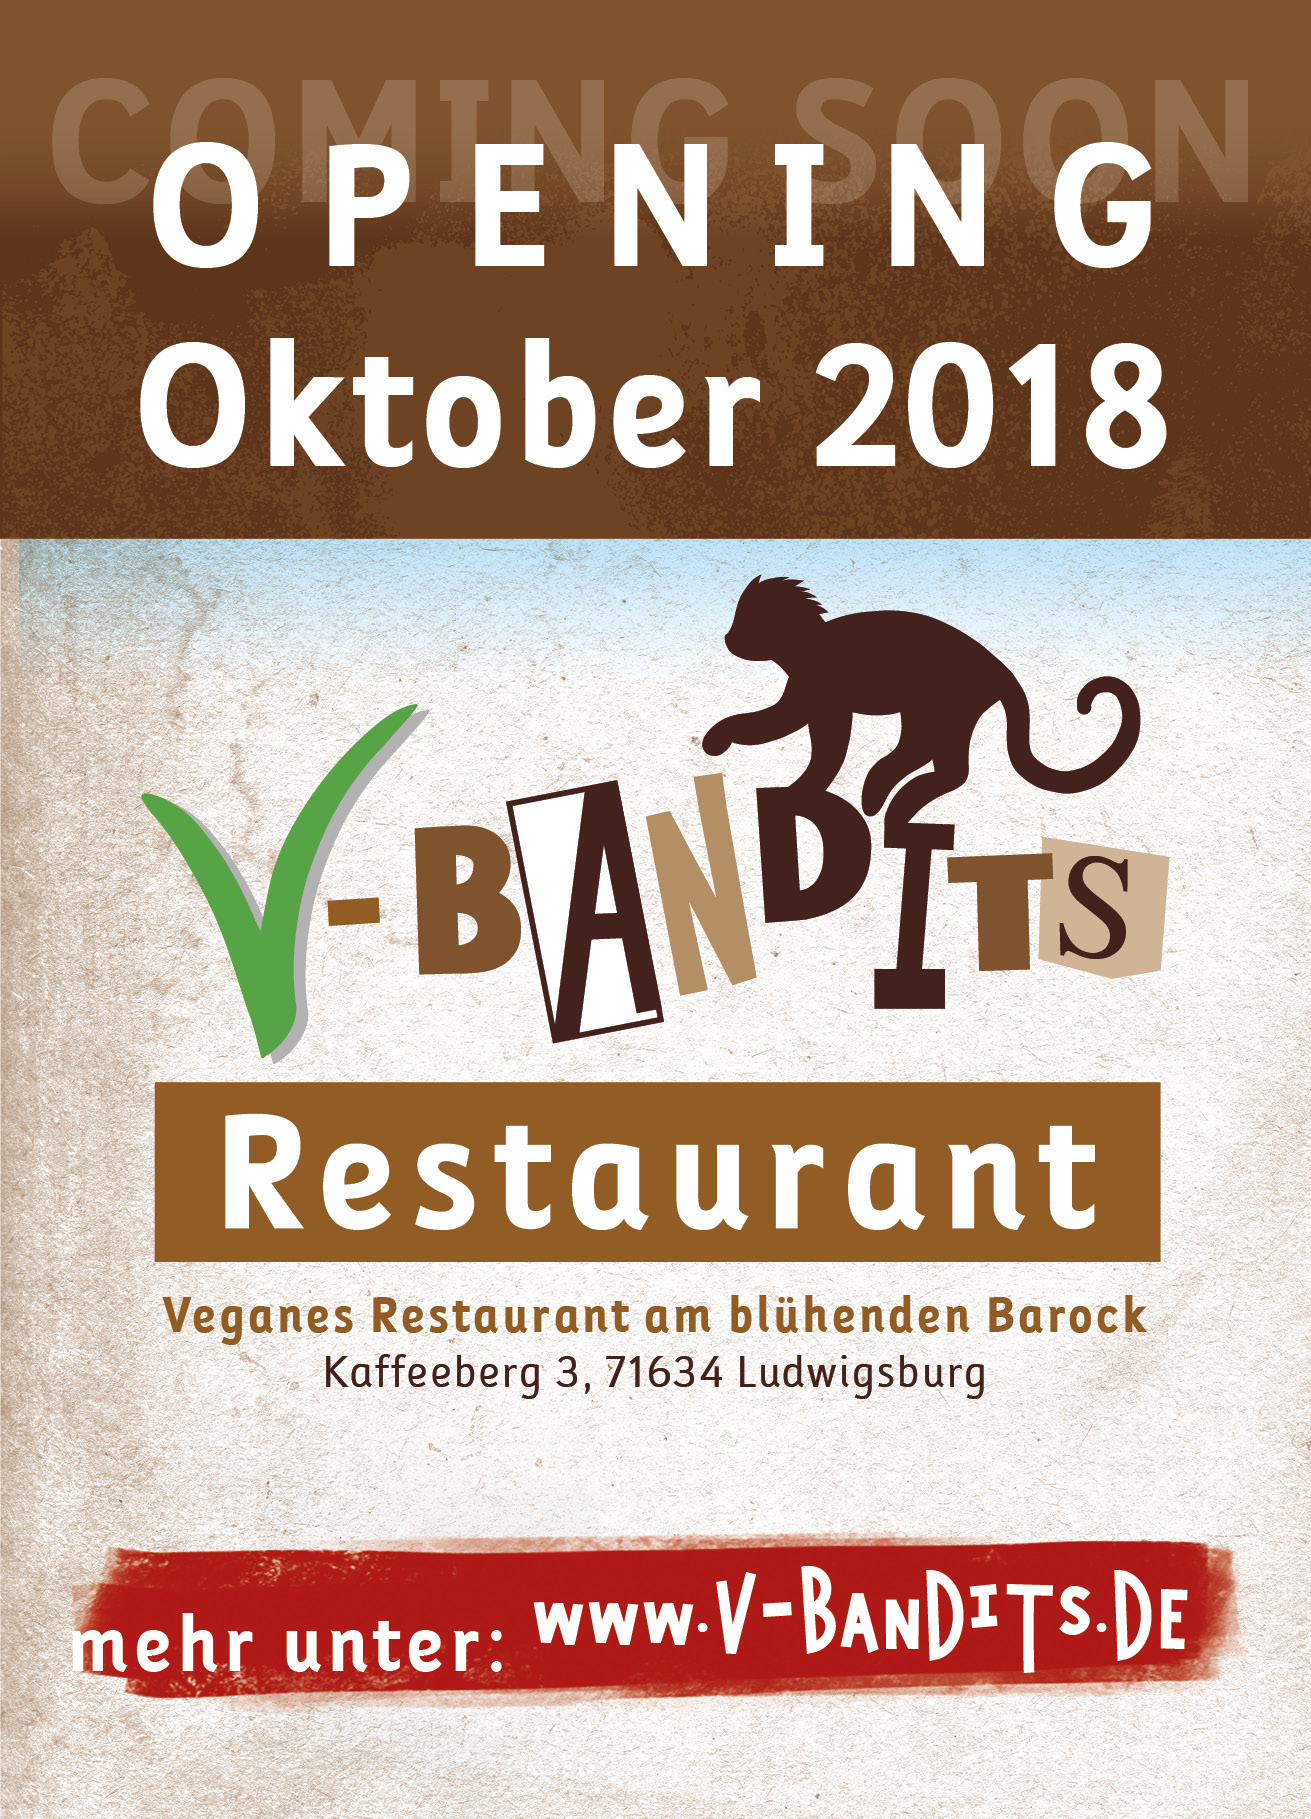 Vegan & mediterran essen in Ludwigsburg: Vegan Bandits